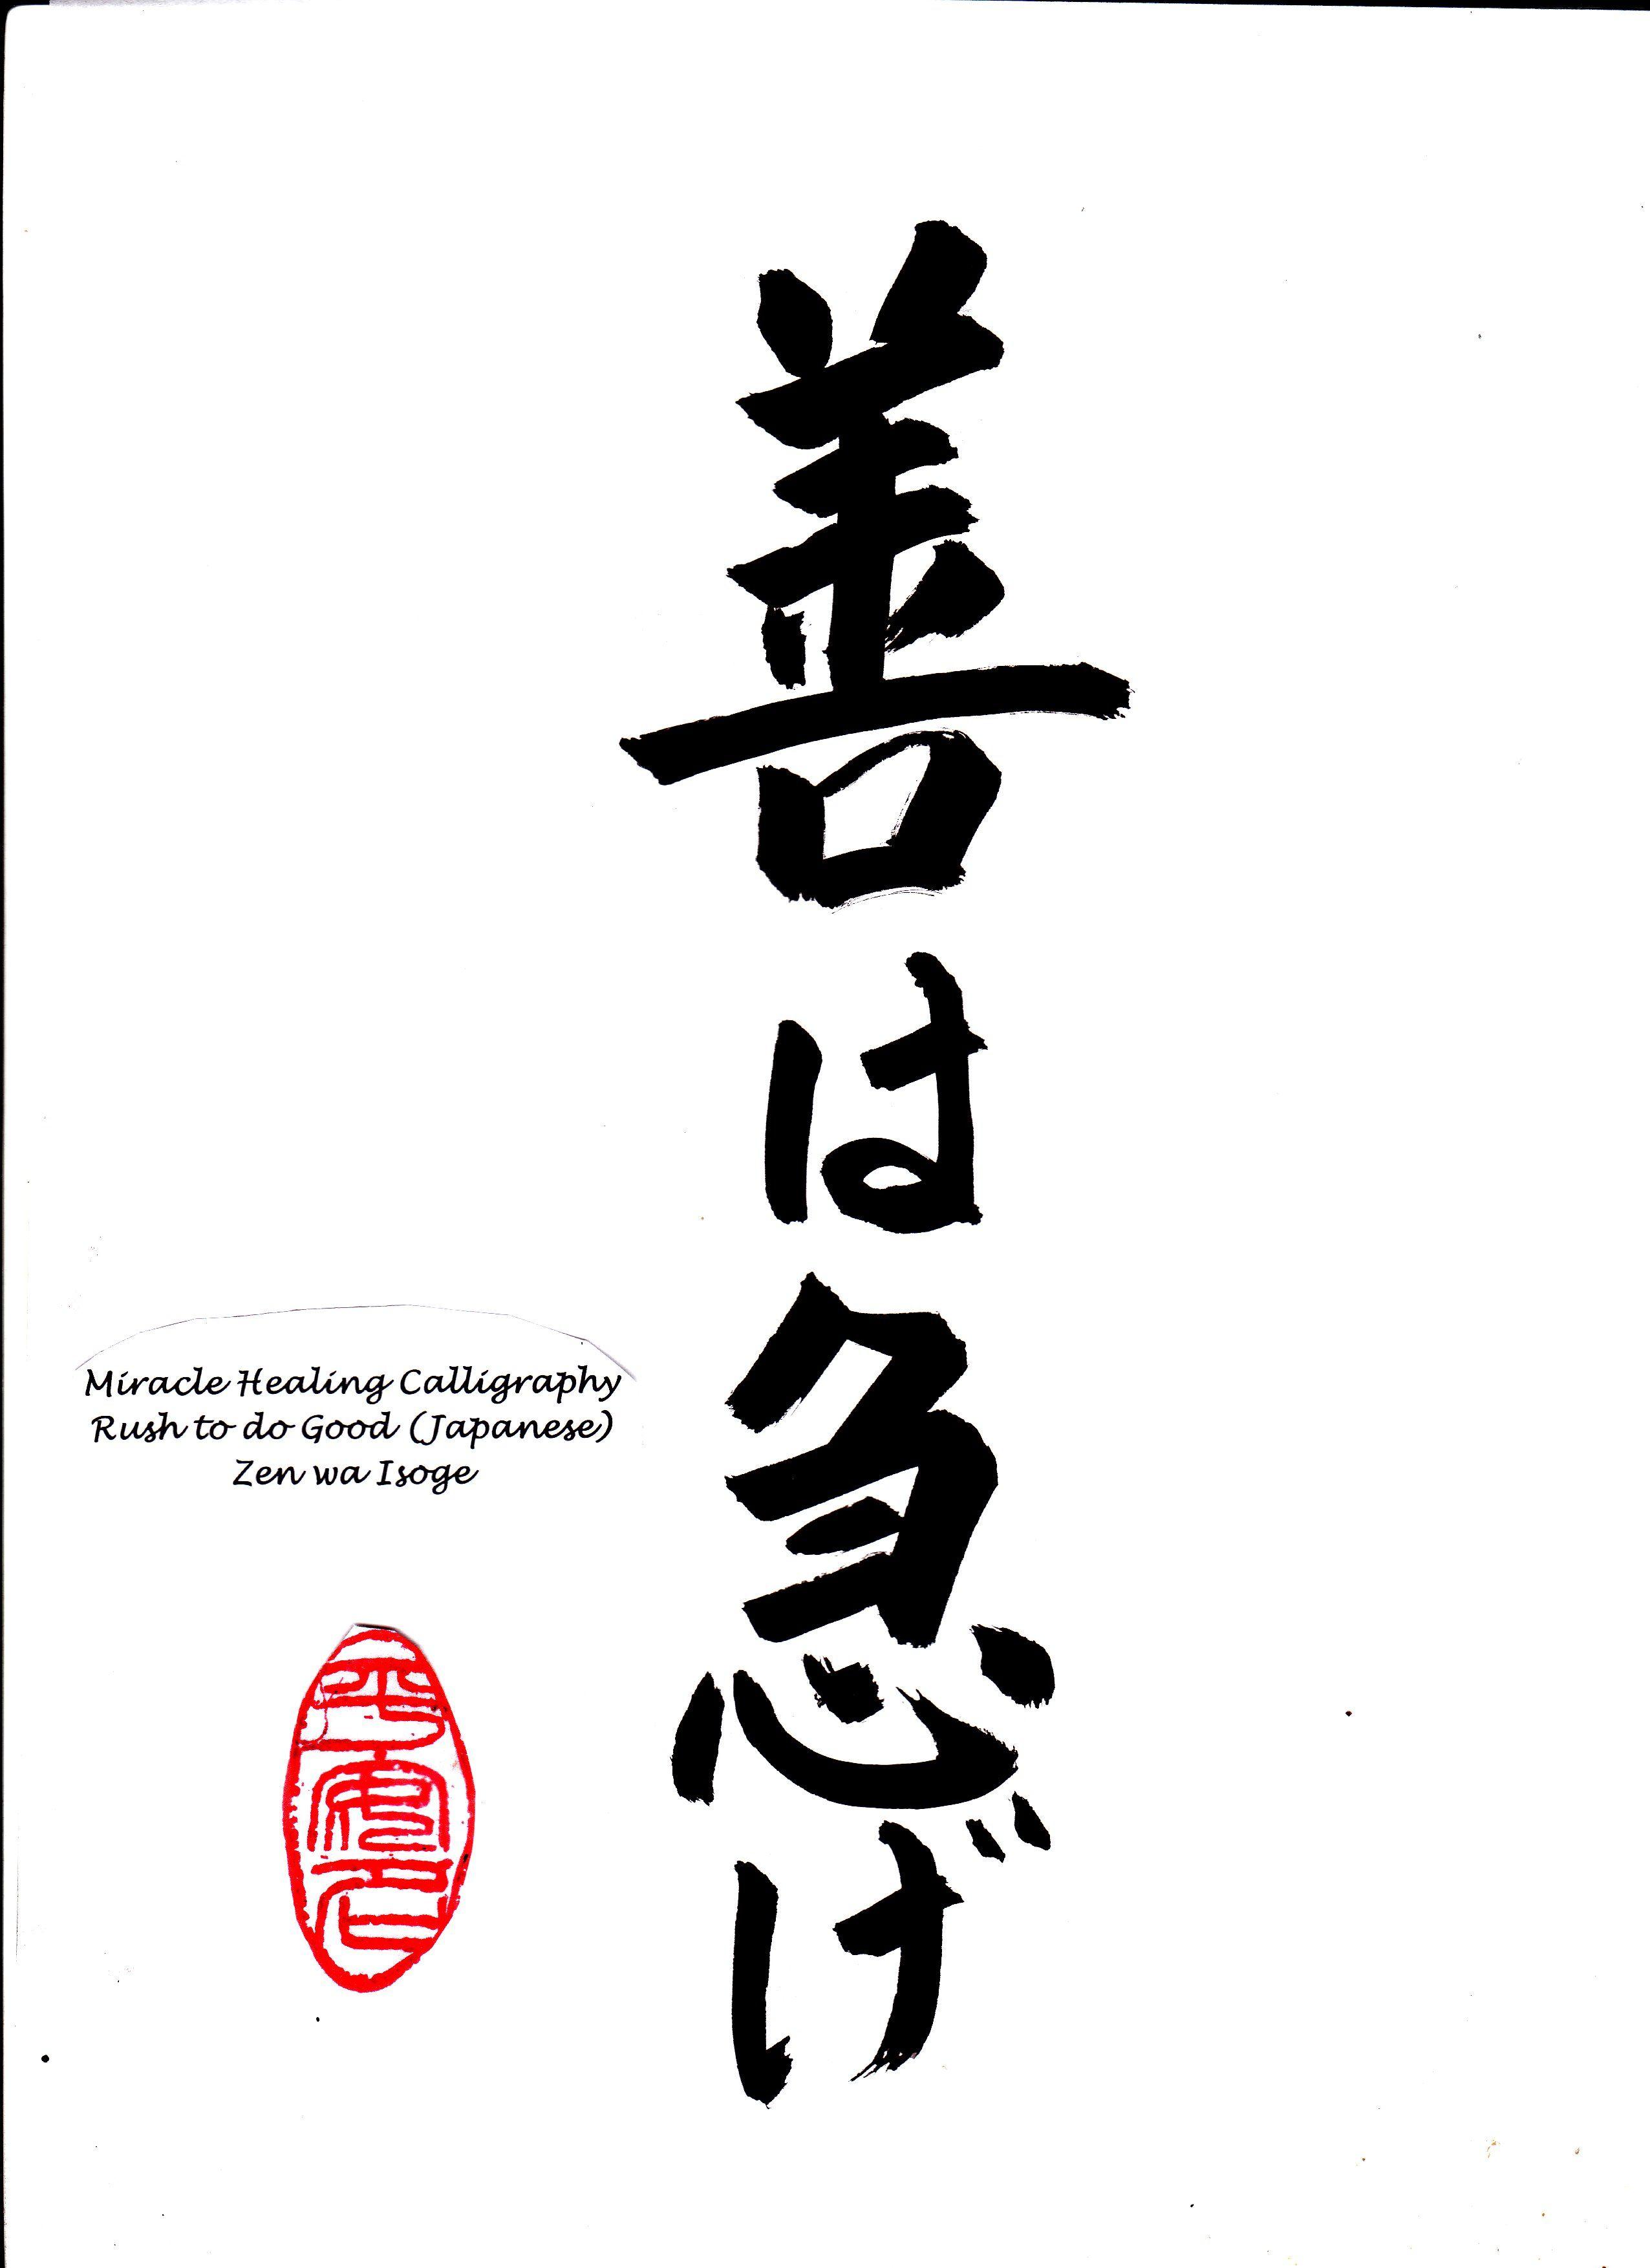 Miracle Healing Calligraphy